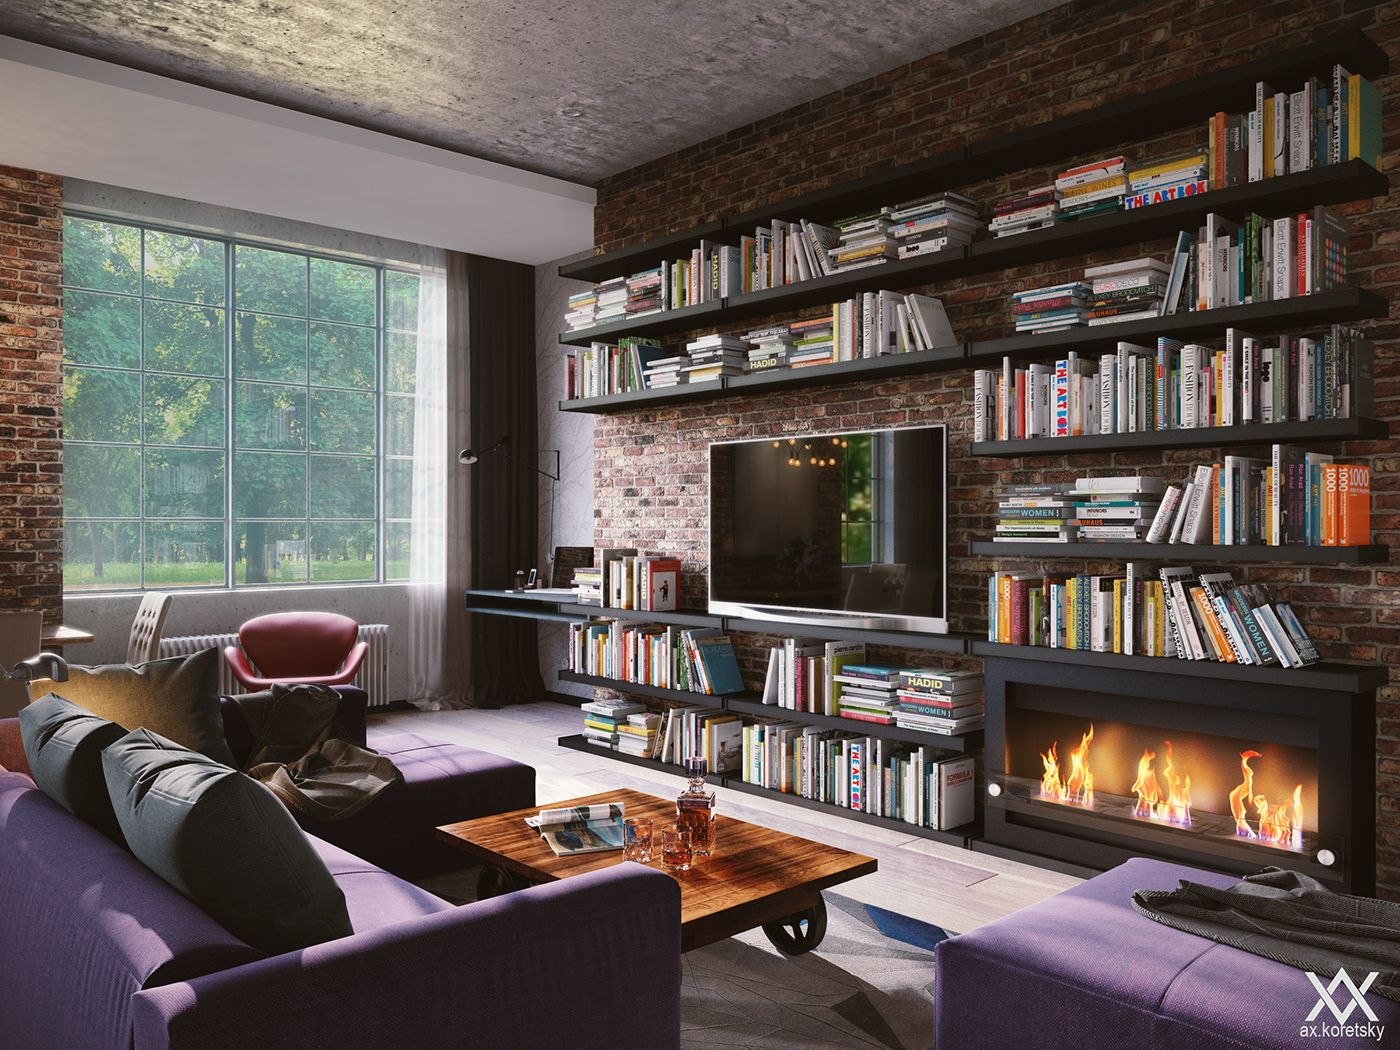 S&L | Loft-style apartment on Behance